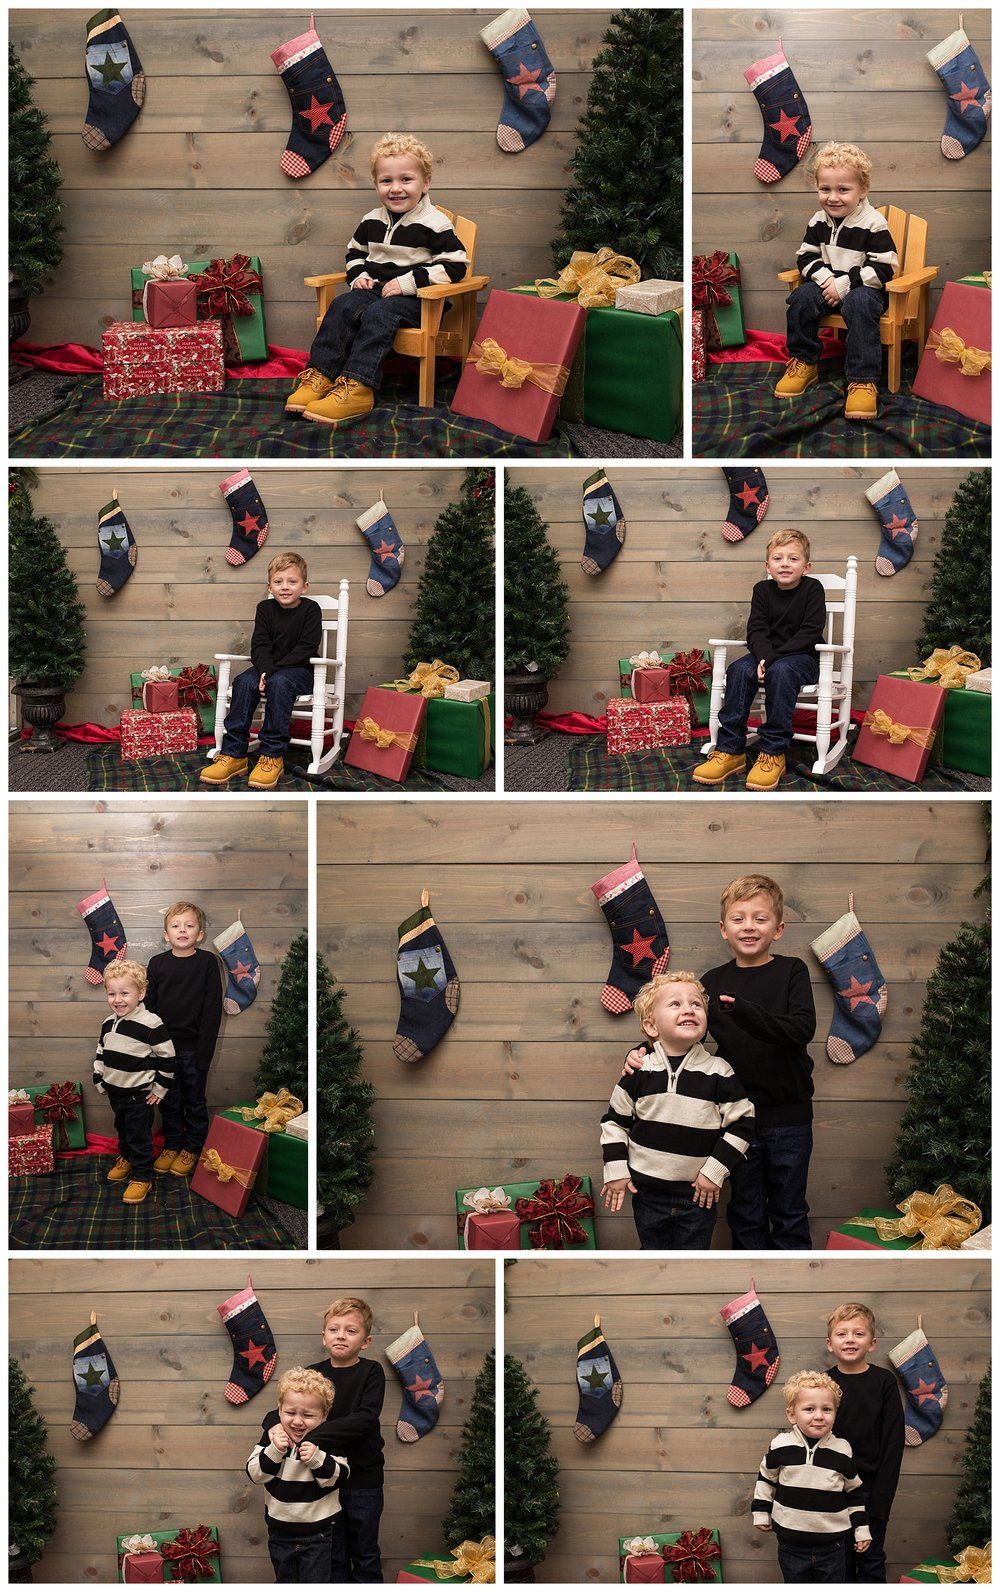 Children's Christmas Photos 2016 Wellsburg, WV